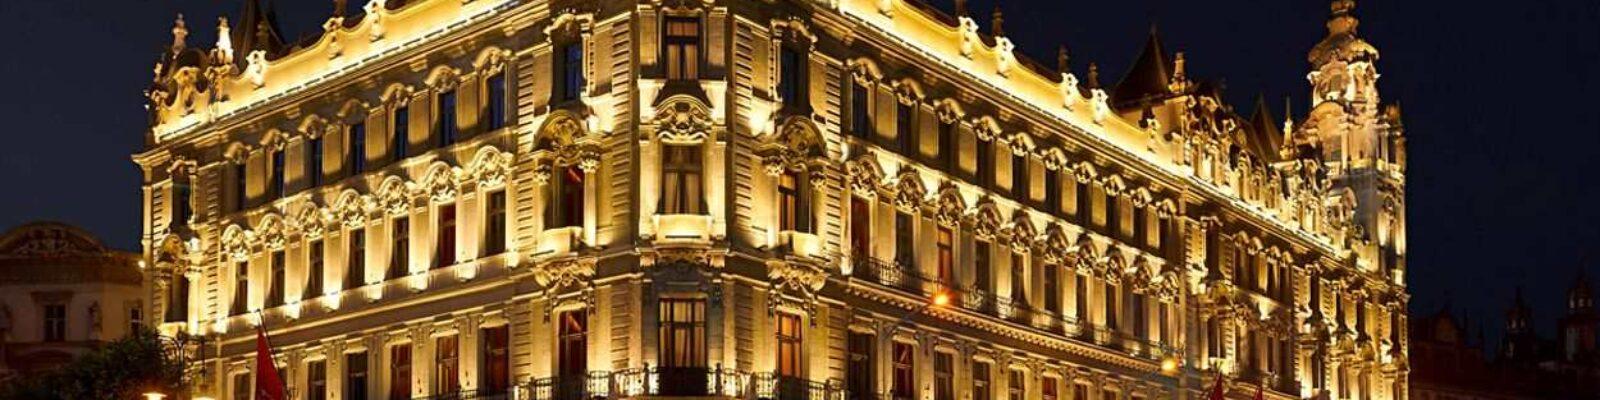 Ungheria Budapest Palazzo Klotild